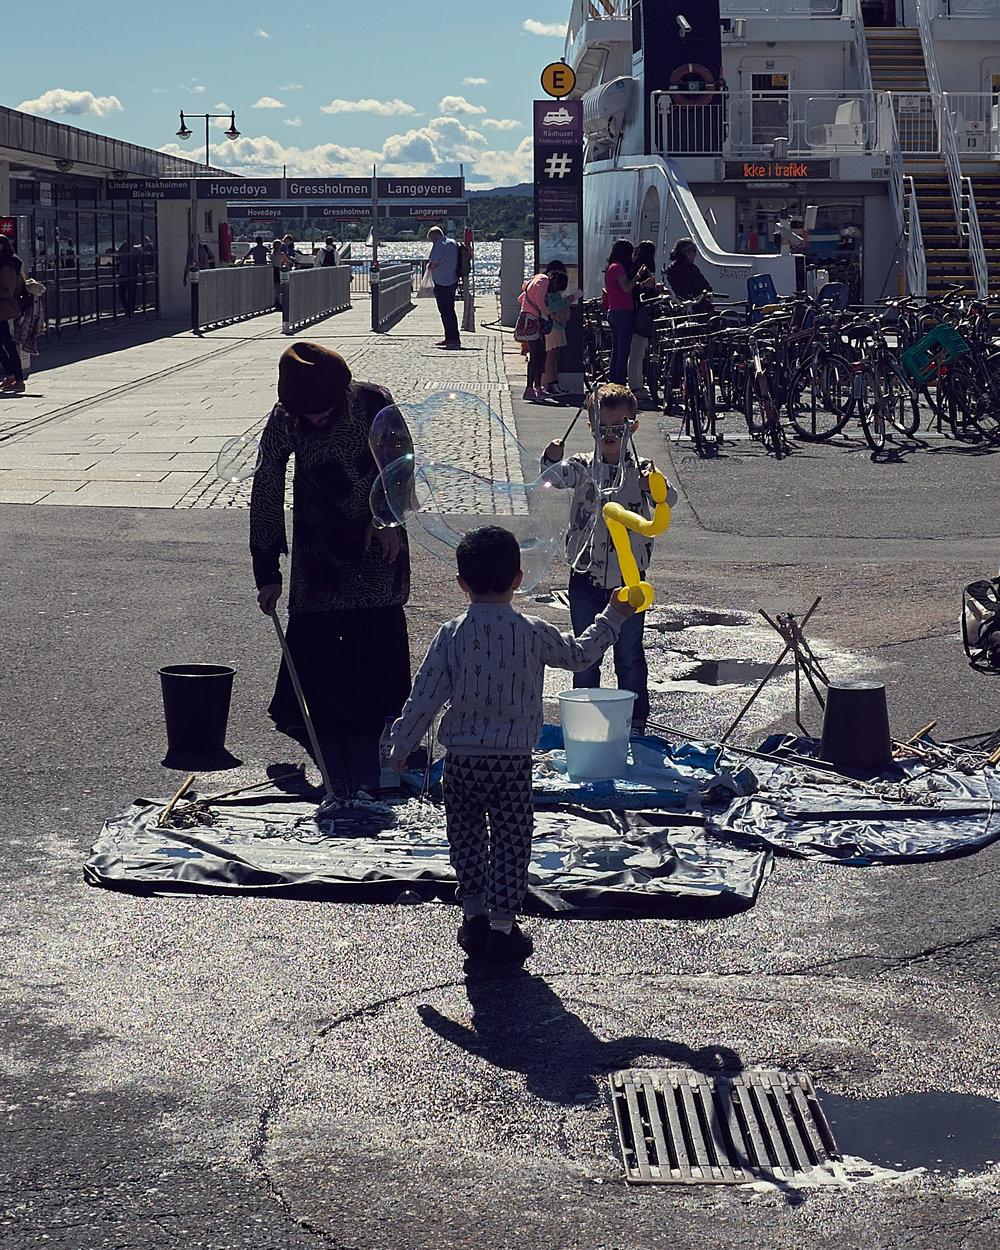 Street performers near Aker brygge